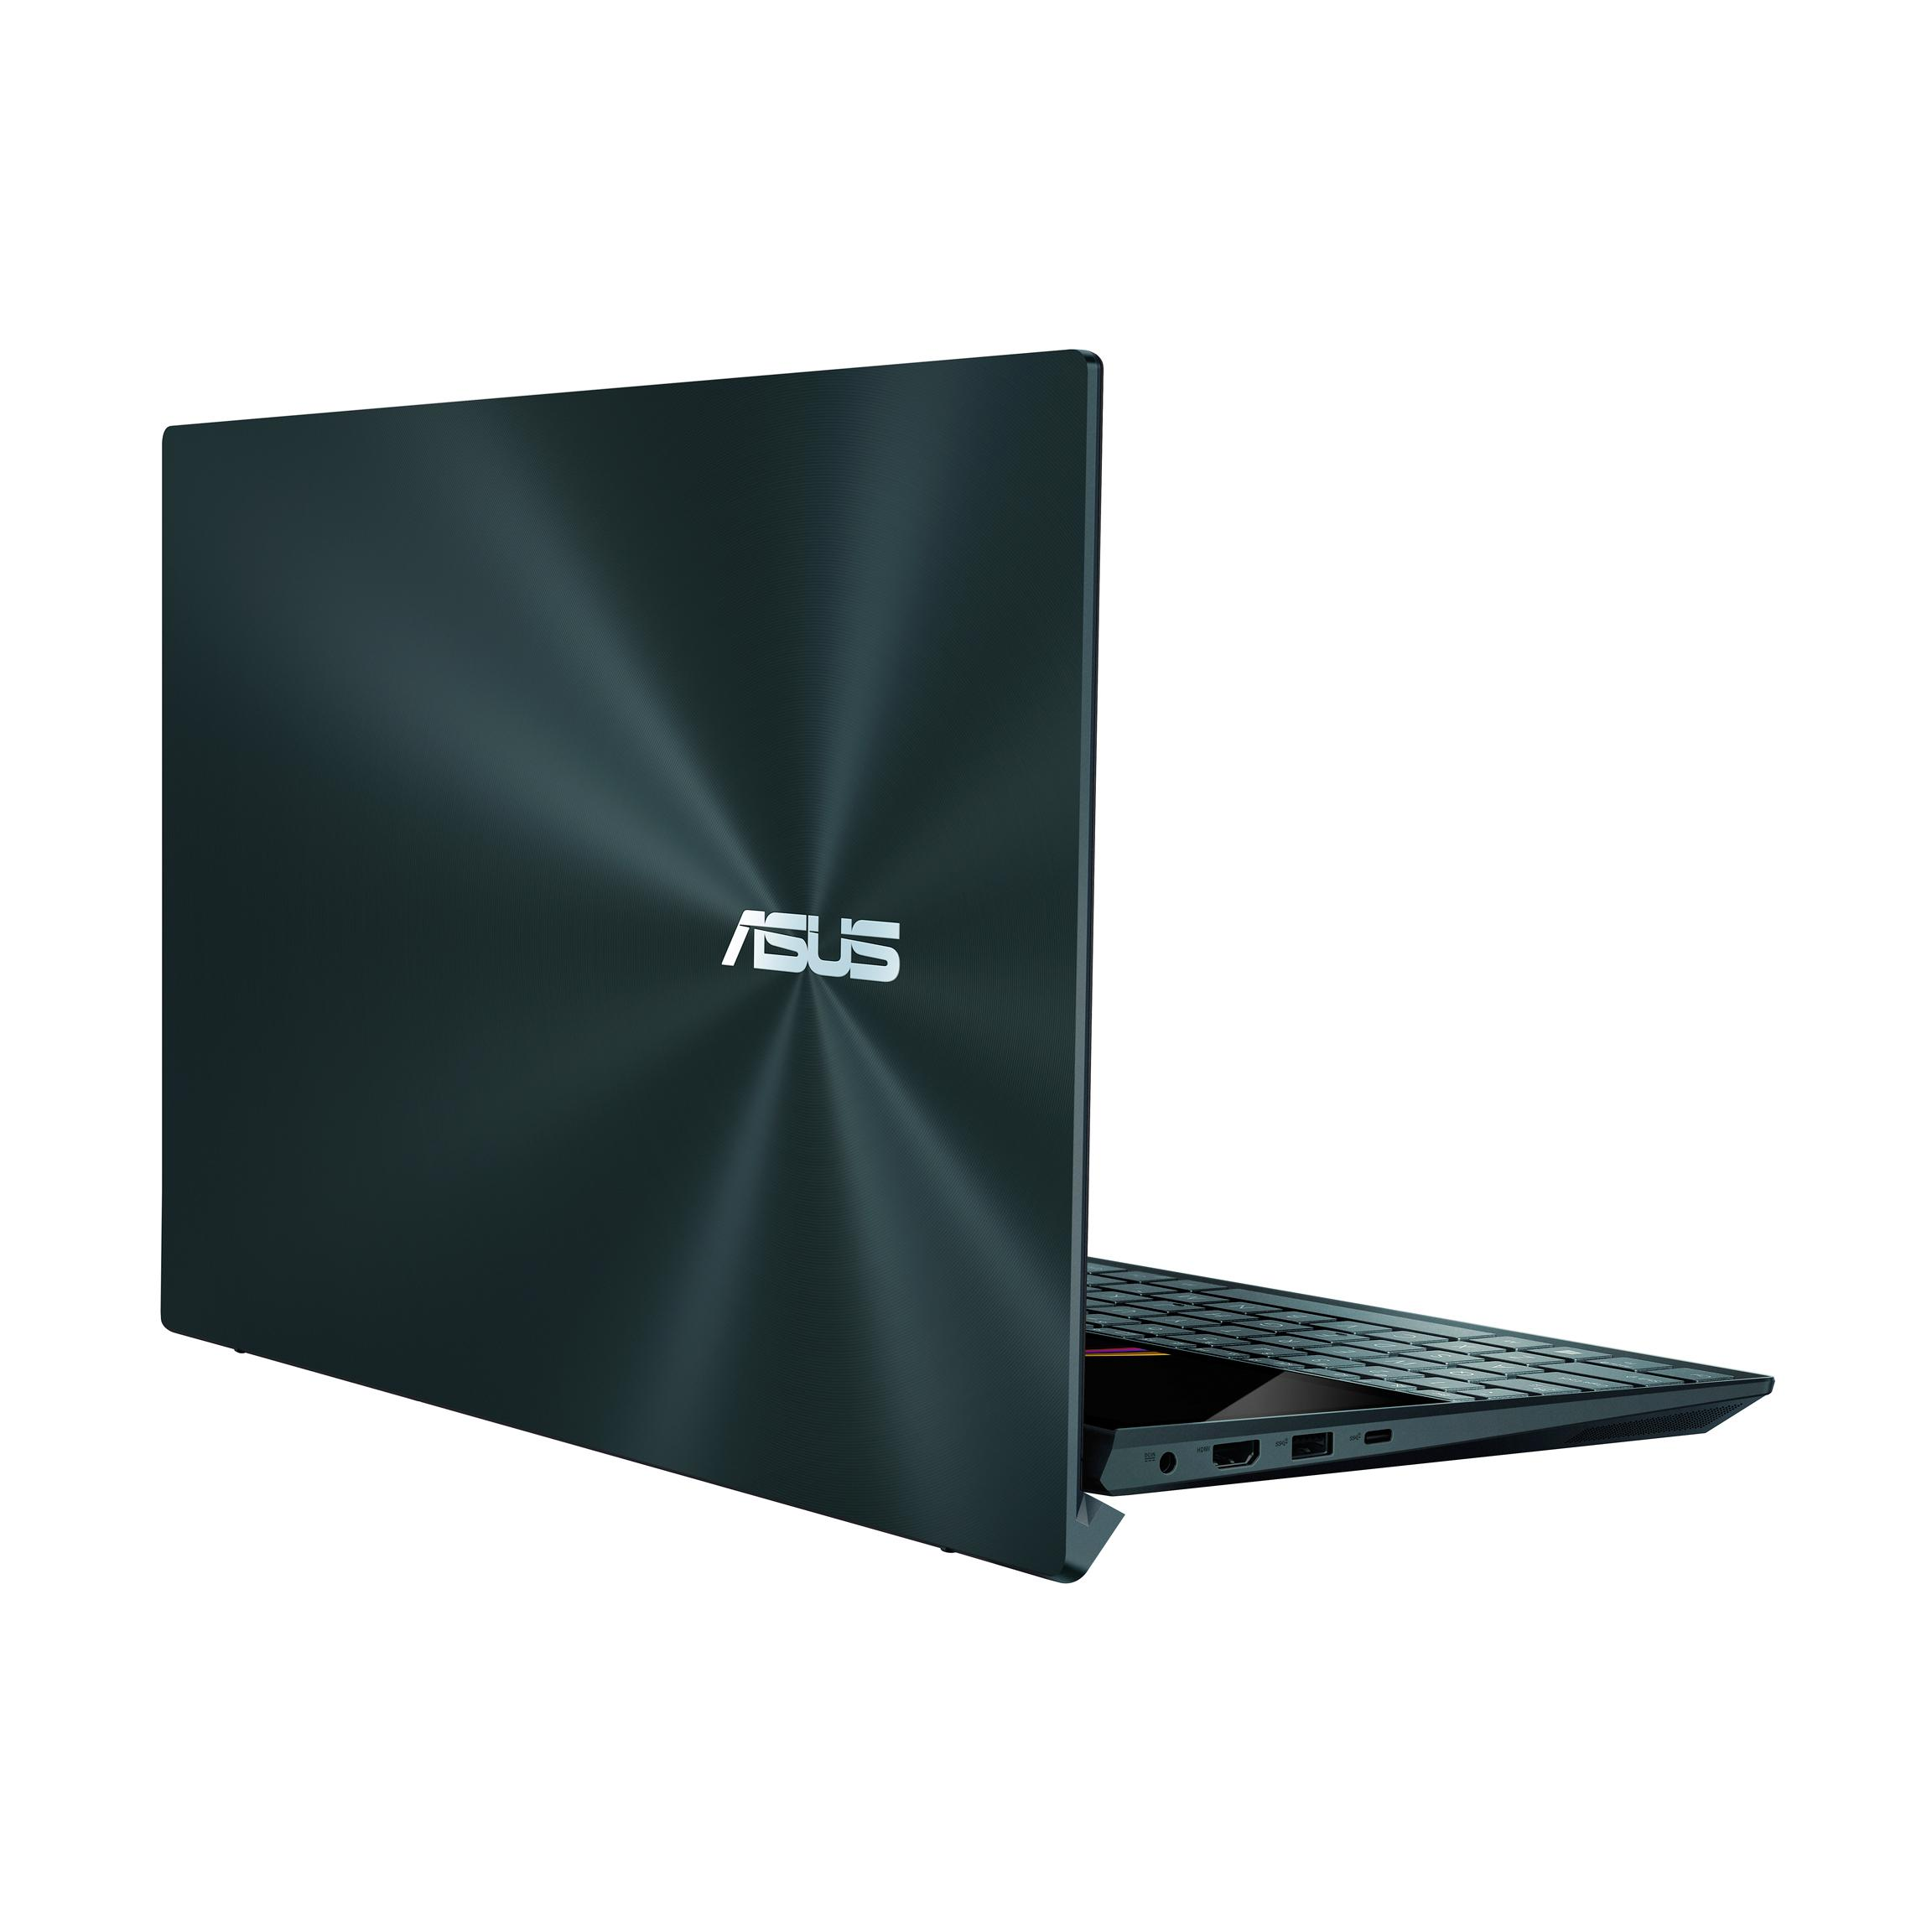 Asus ZenBook UX481FL-XS74T 14-inch (2019) - core i7-10510U - 16 GB - SSD 1 TB